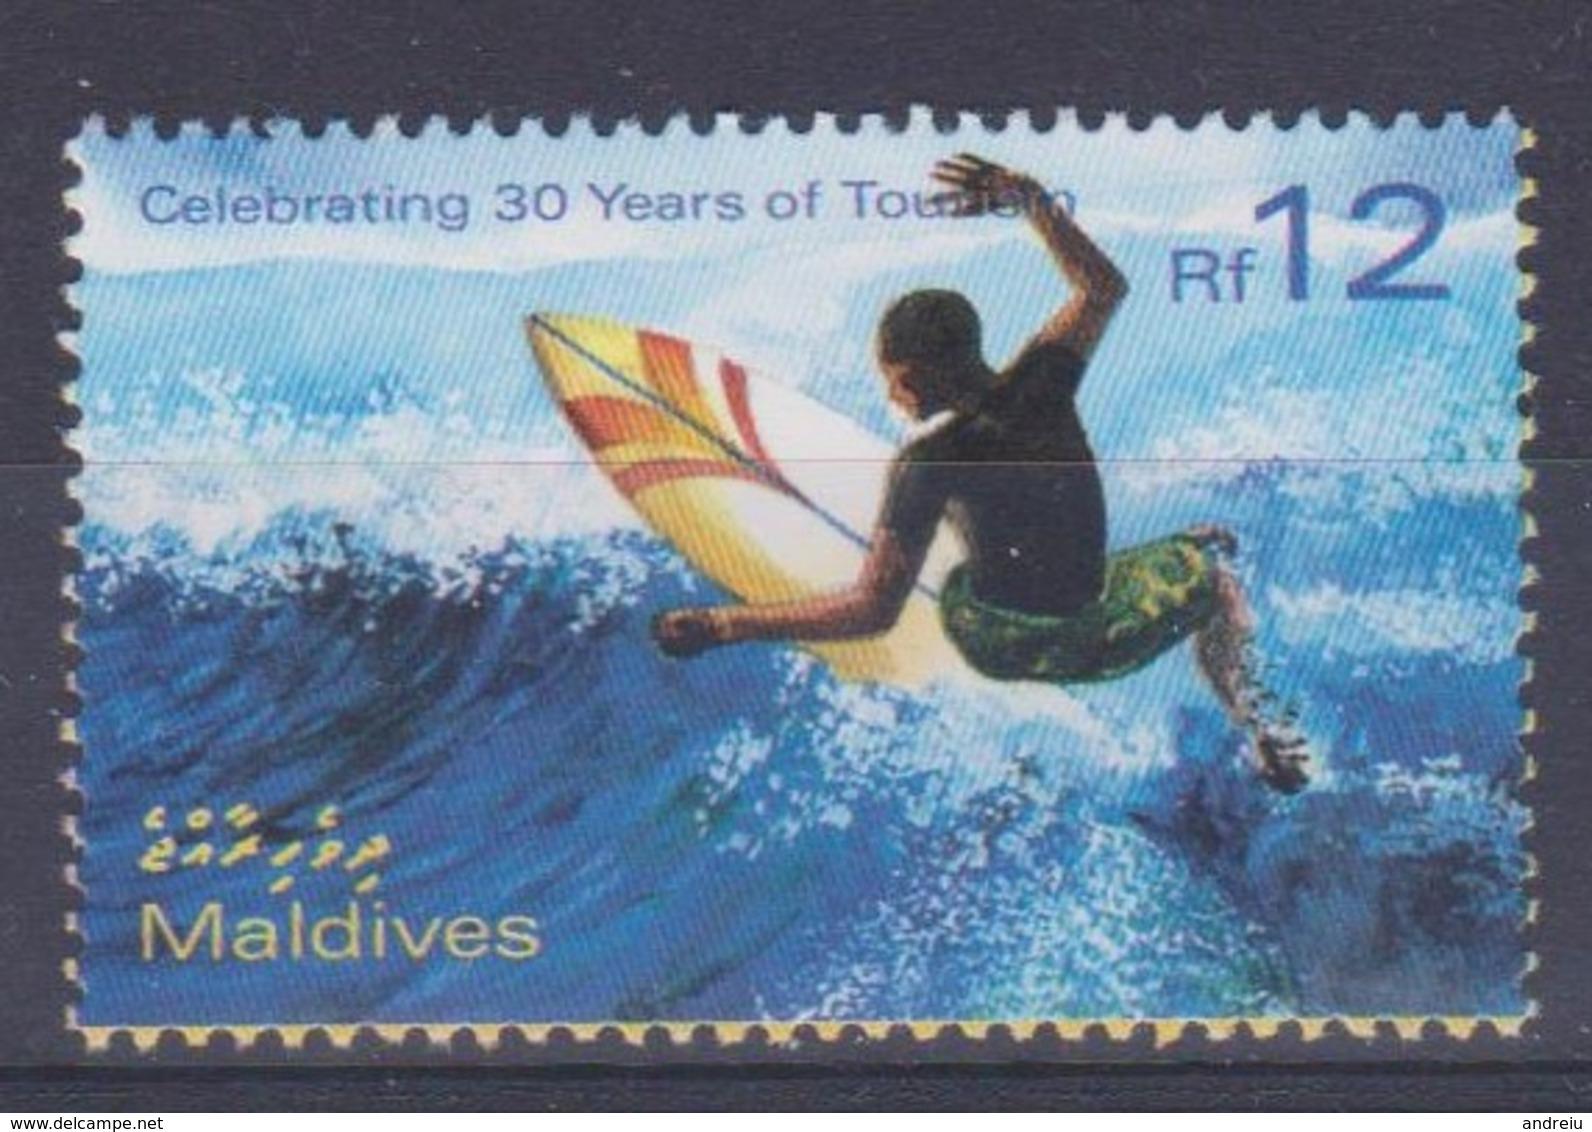 2002 Maldives - Celebrating 30 Years Of Tourism, Sea, Vawes, Surfing, Skateboard Yt 3401 MNH - Skateboard